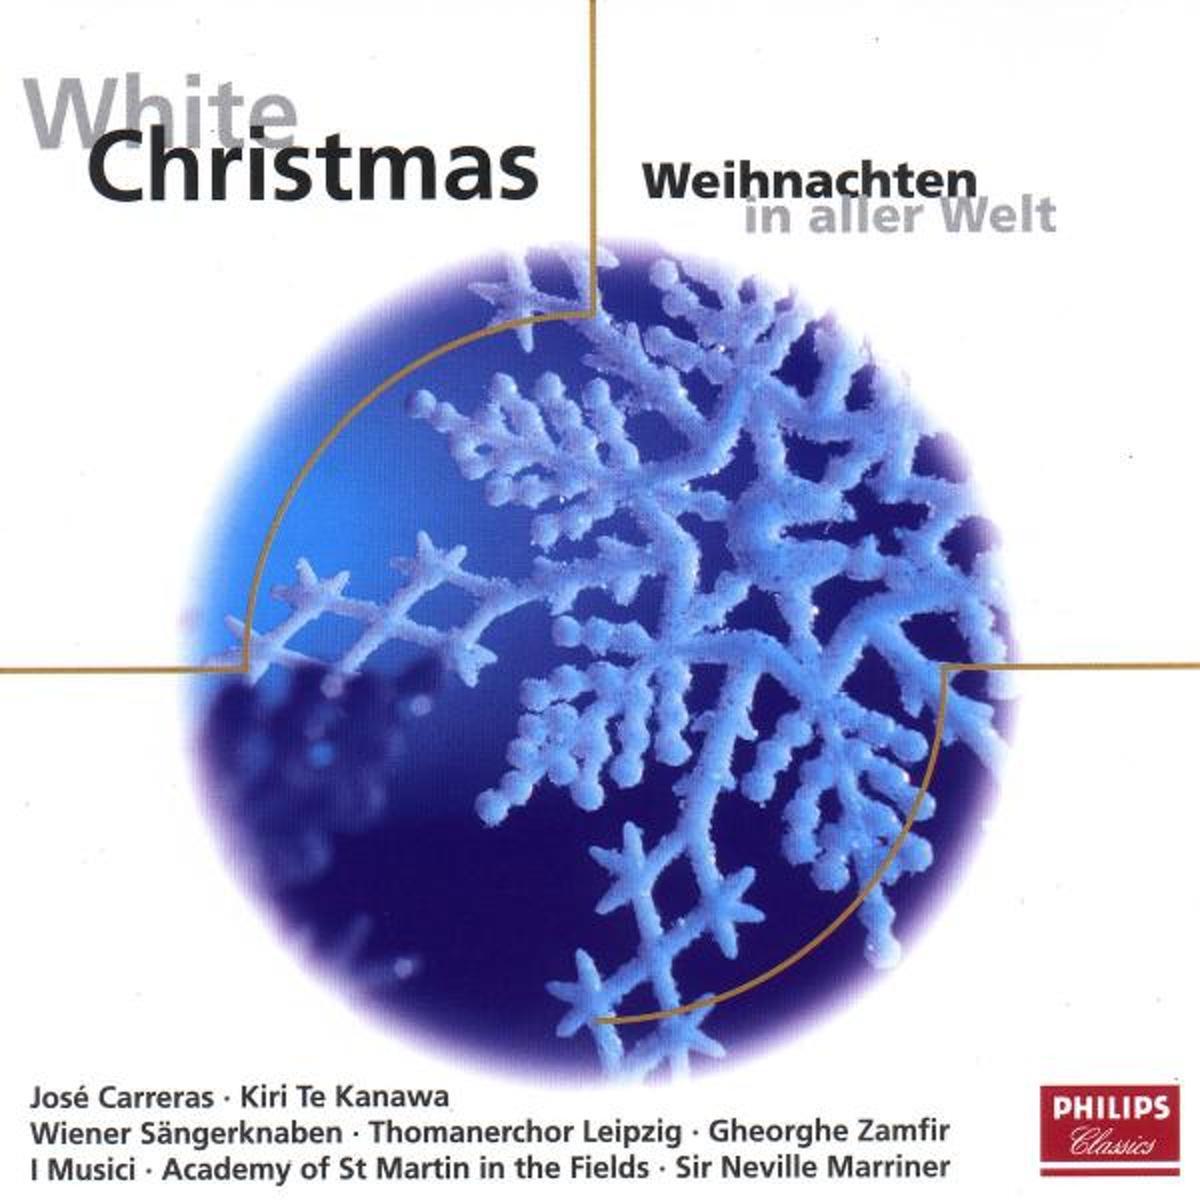 White Christmas kopen